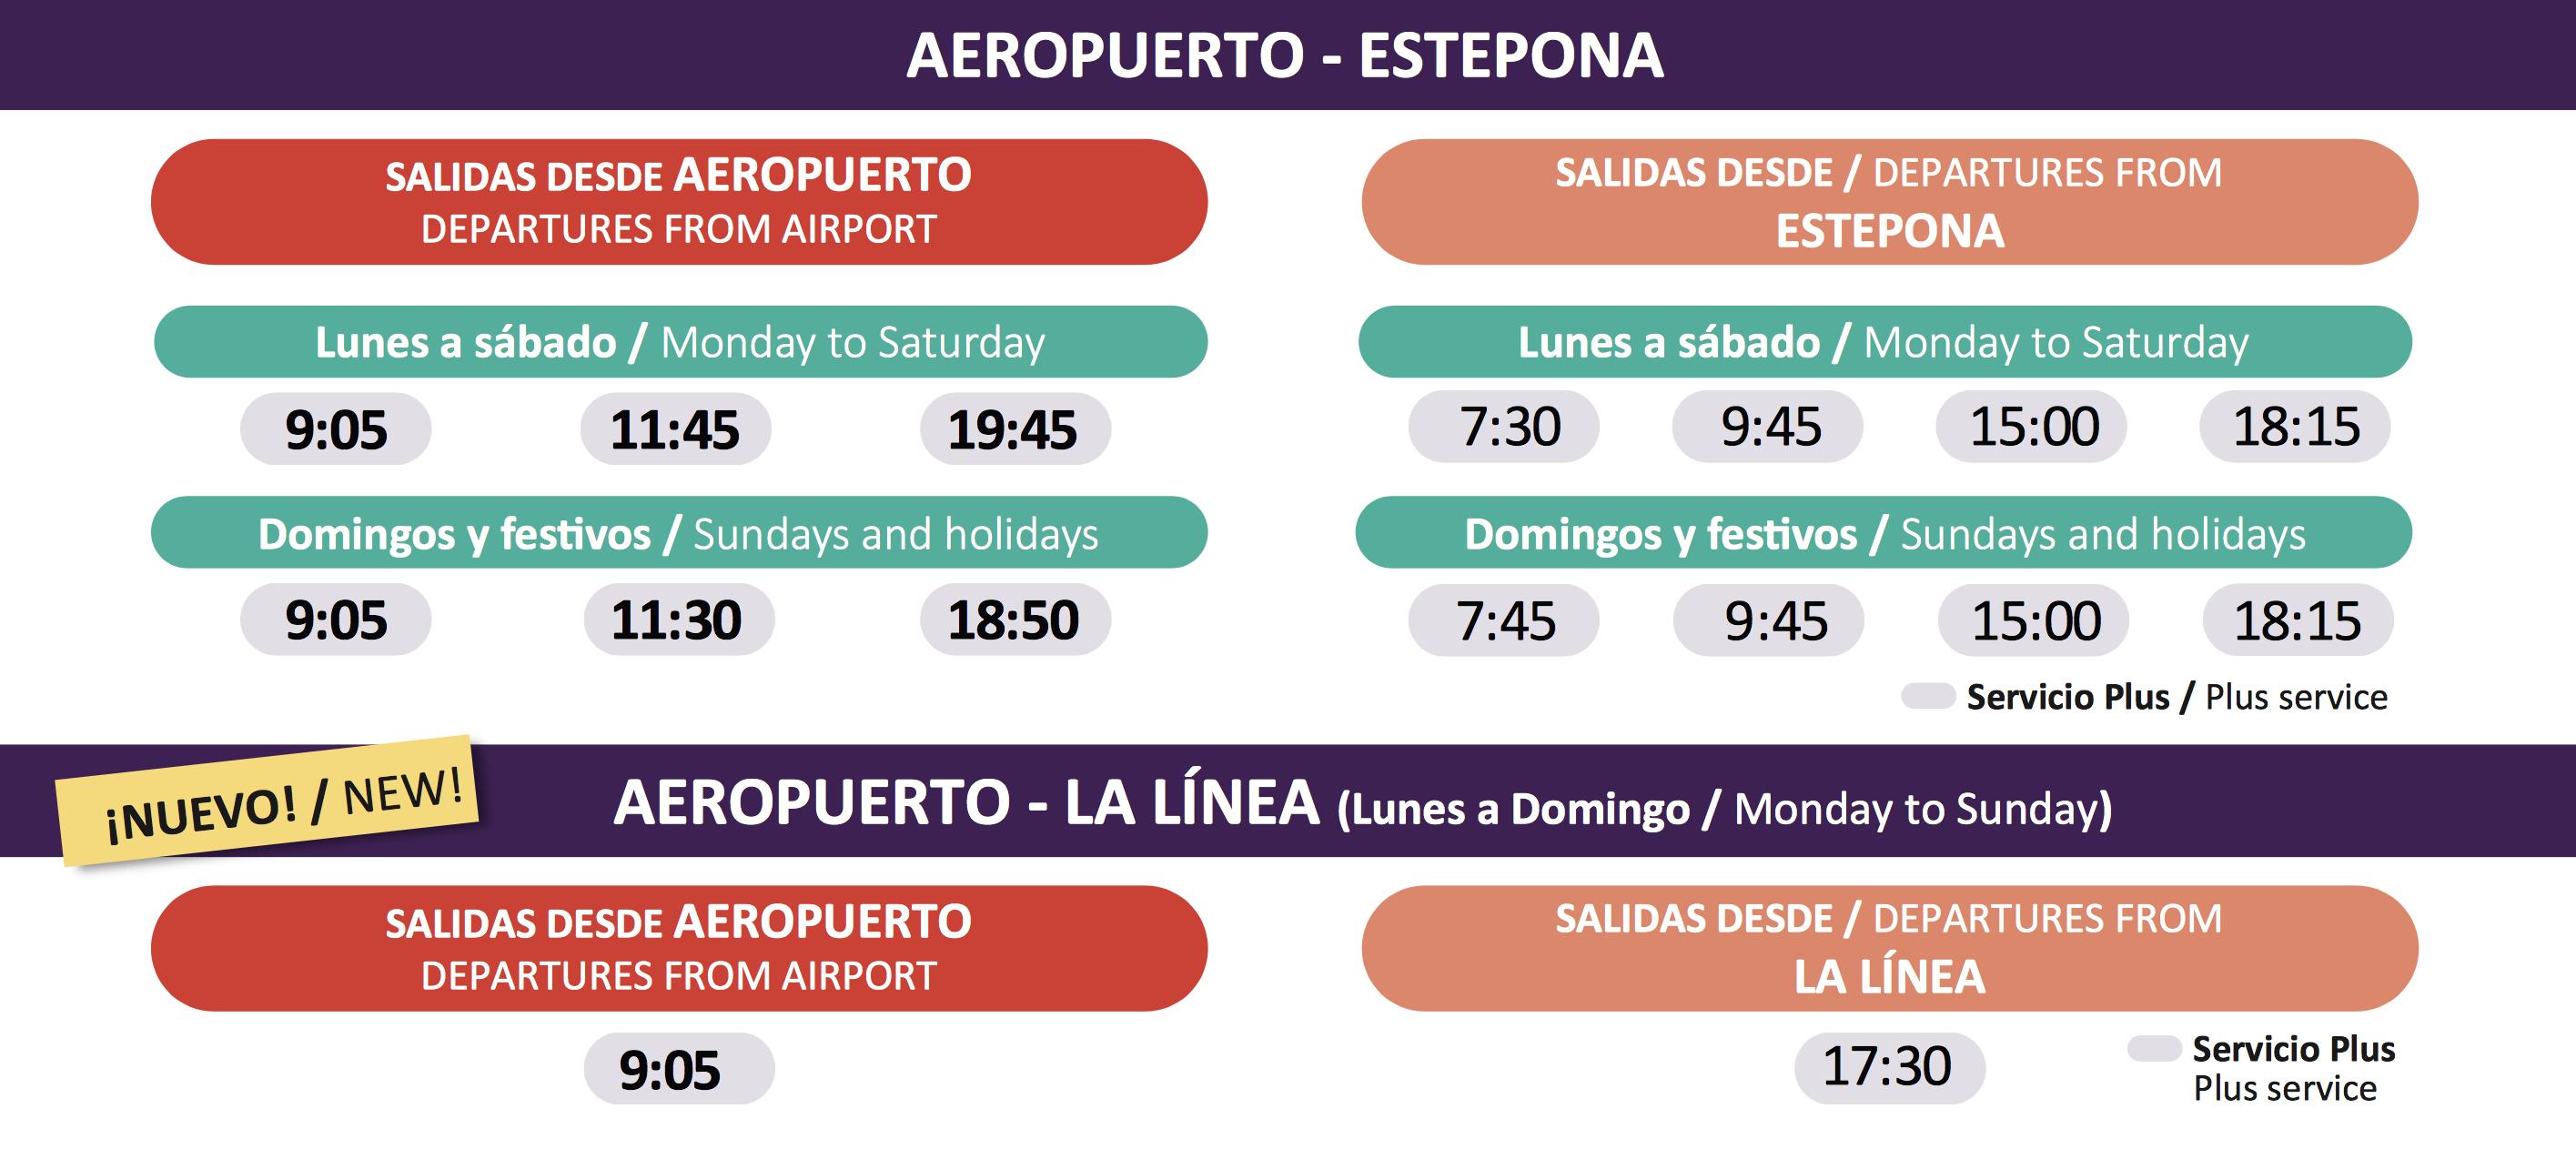 Malaga Airport to Estepona